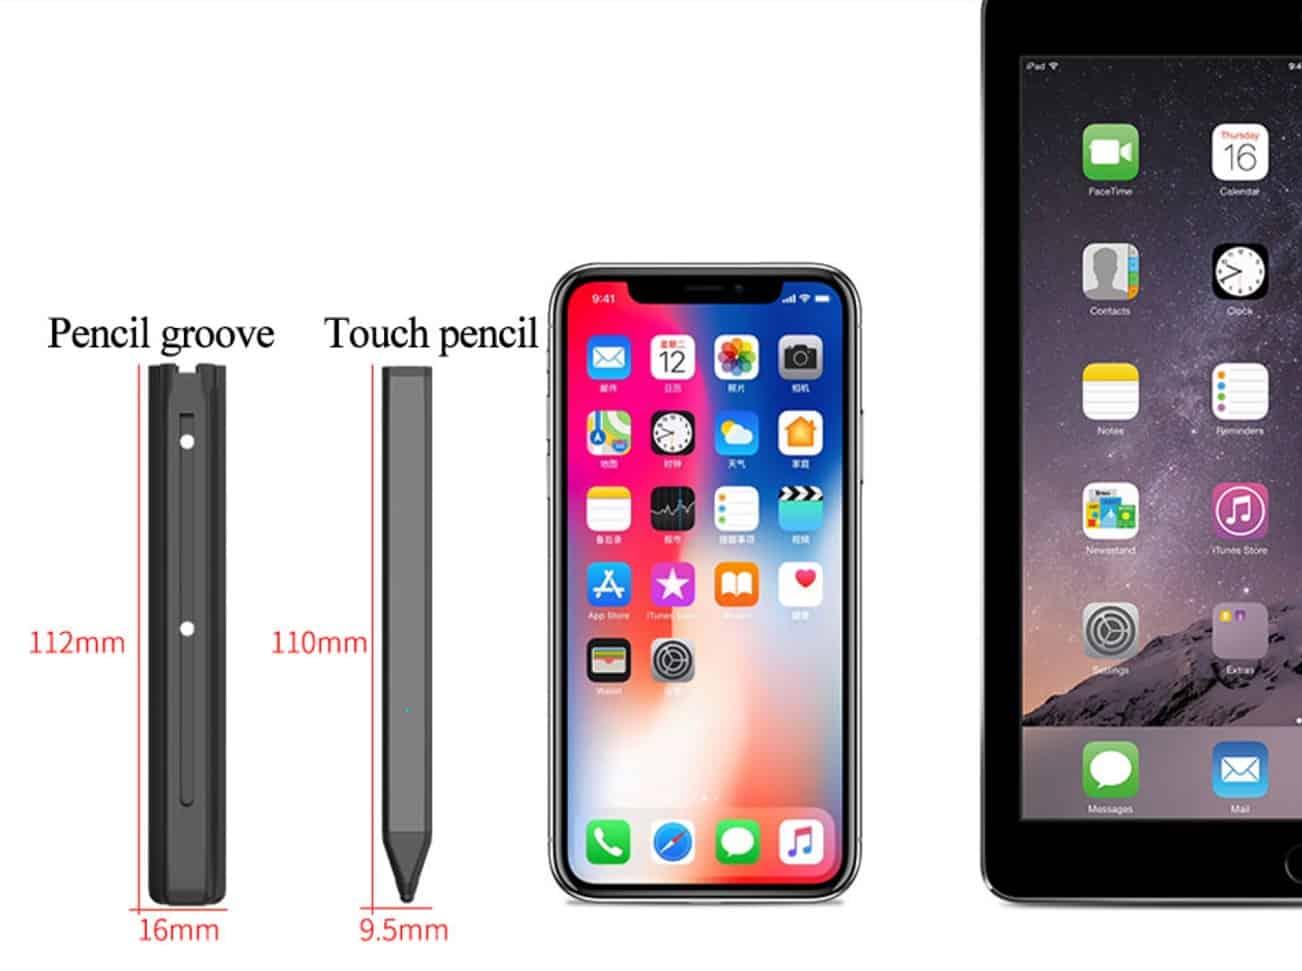 Top Best Fake Smart pen apple pencil replica Cheap alternative AliExpress Ipad pro Stylus Black 4 Pencil Case